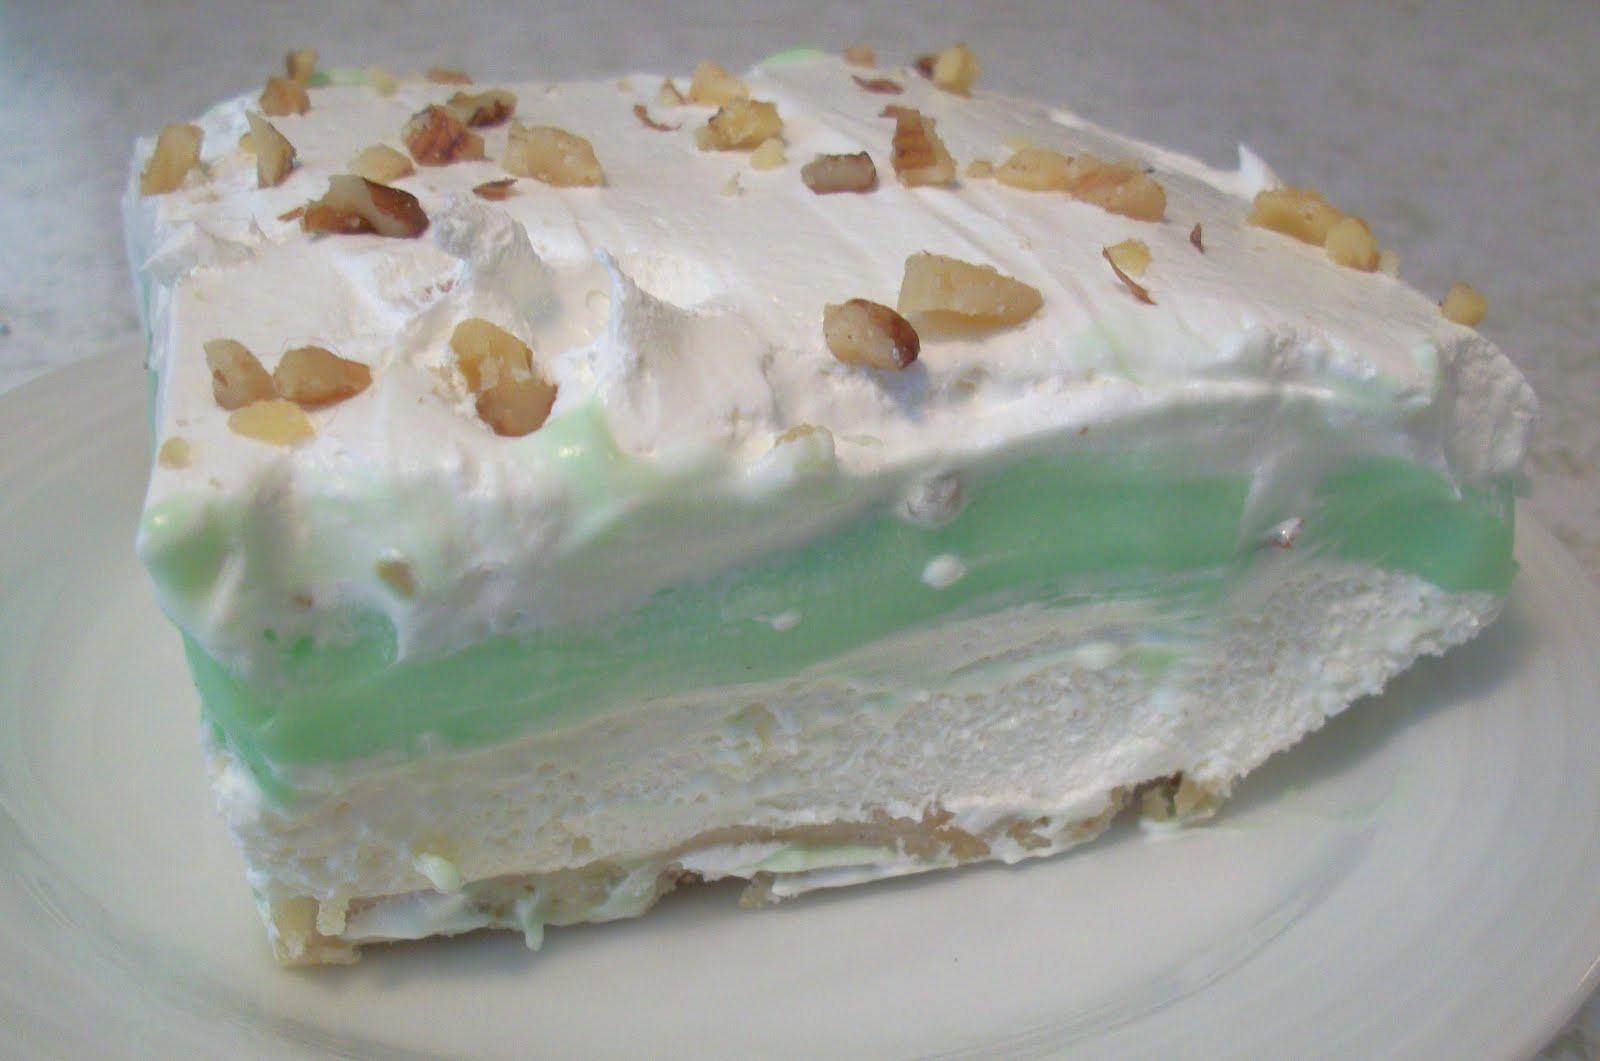 Pistachio Pudding Dessert  The Big Green Bowl Creamy Pistachio Dessert